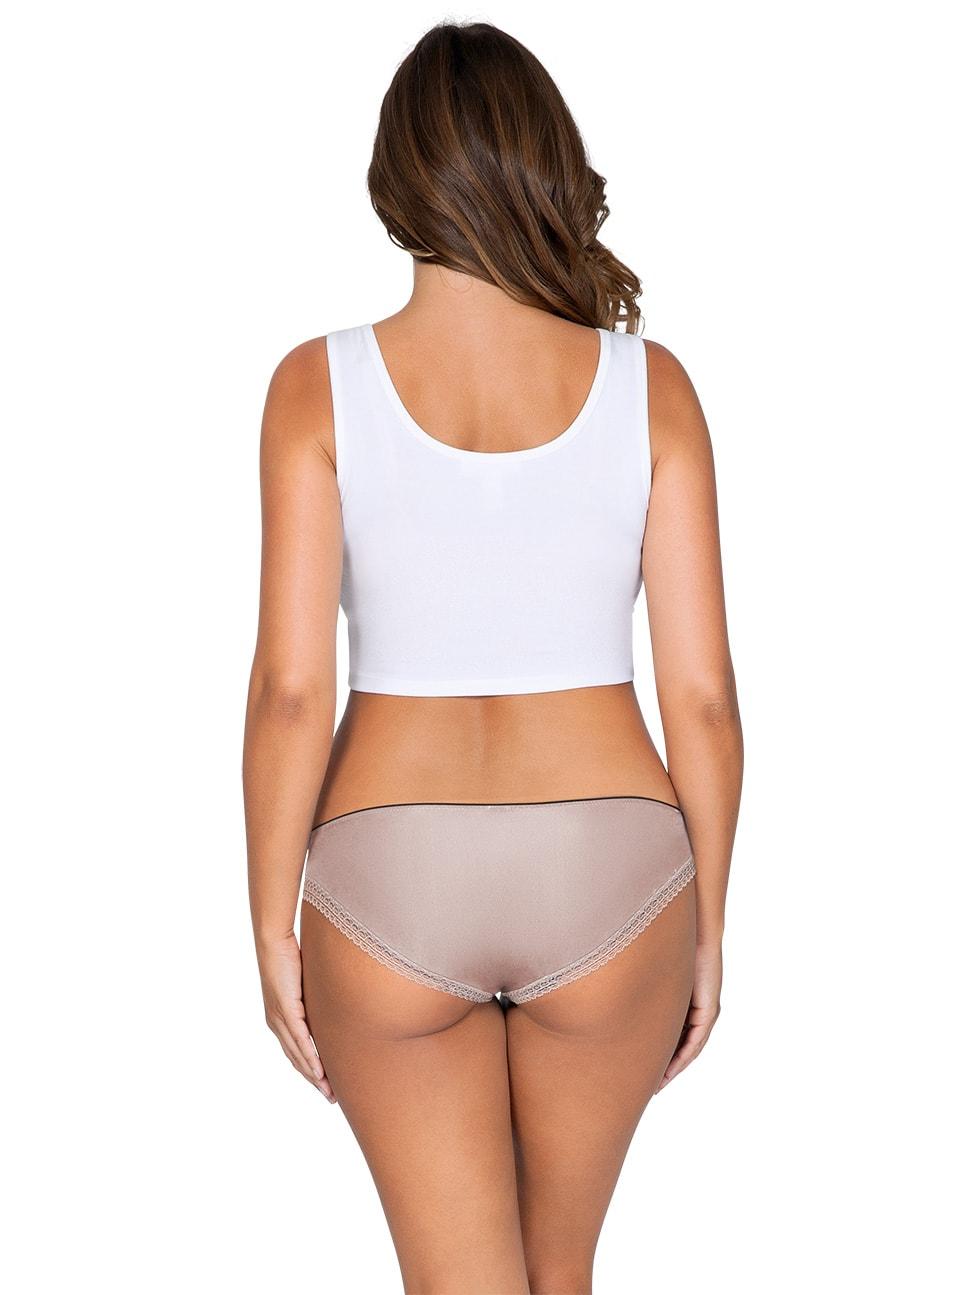 ParfaitPantyBikini PP301 B NudeBack - Panty So Lovely Bikini European Nude PP301